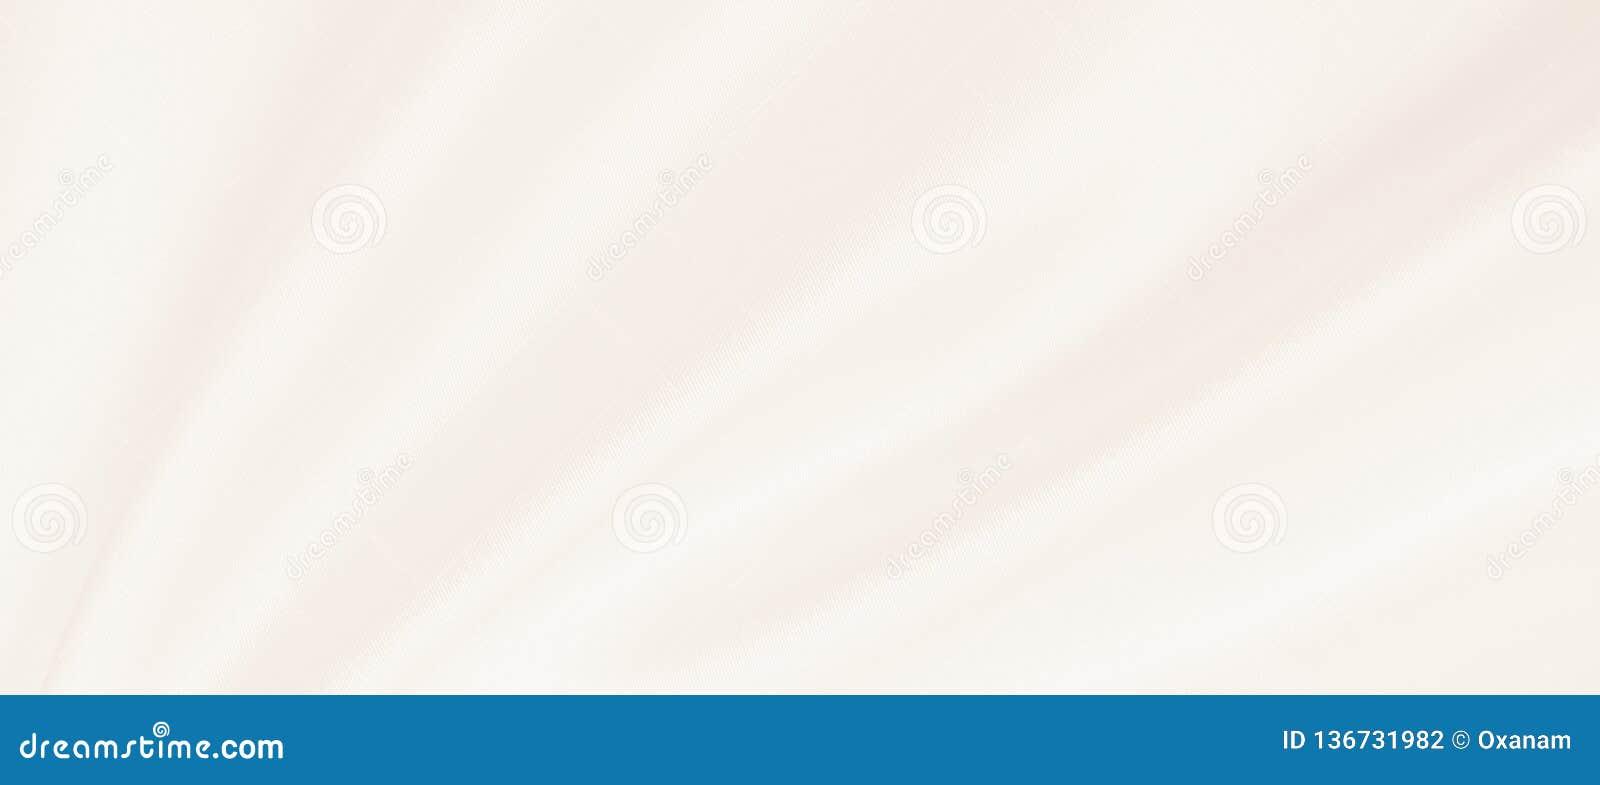 Textura luxuosa dourada elegante lisa de pano da seda ou do cetim como o fundo do casamento Projeto luxuoso do fundo No sepia ton